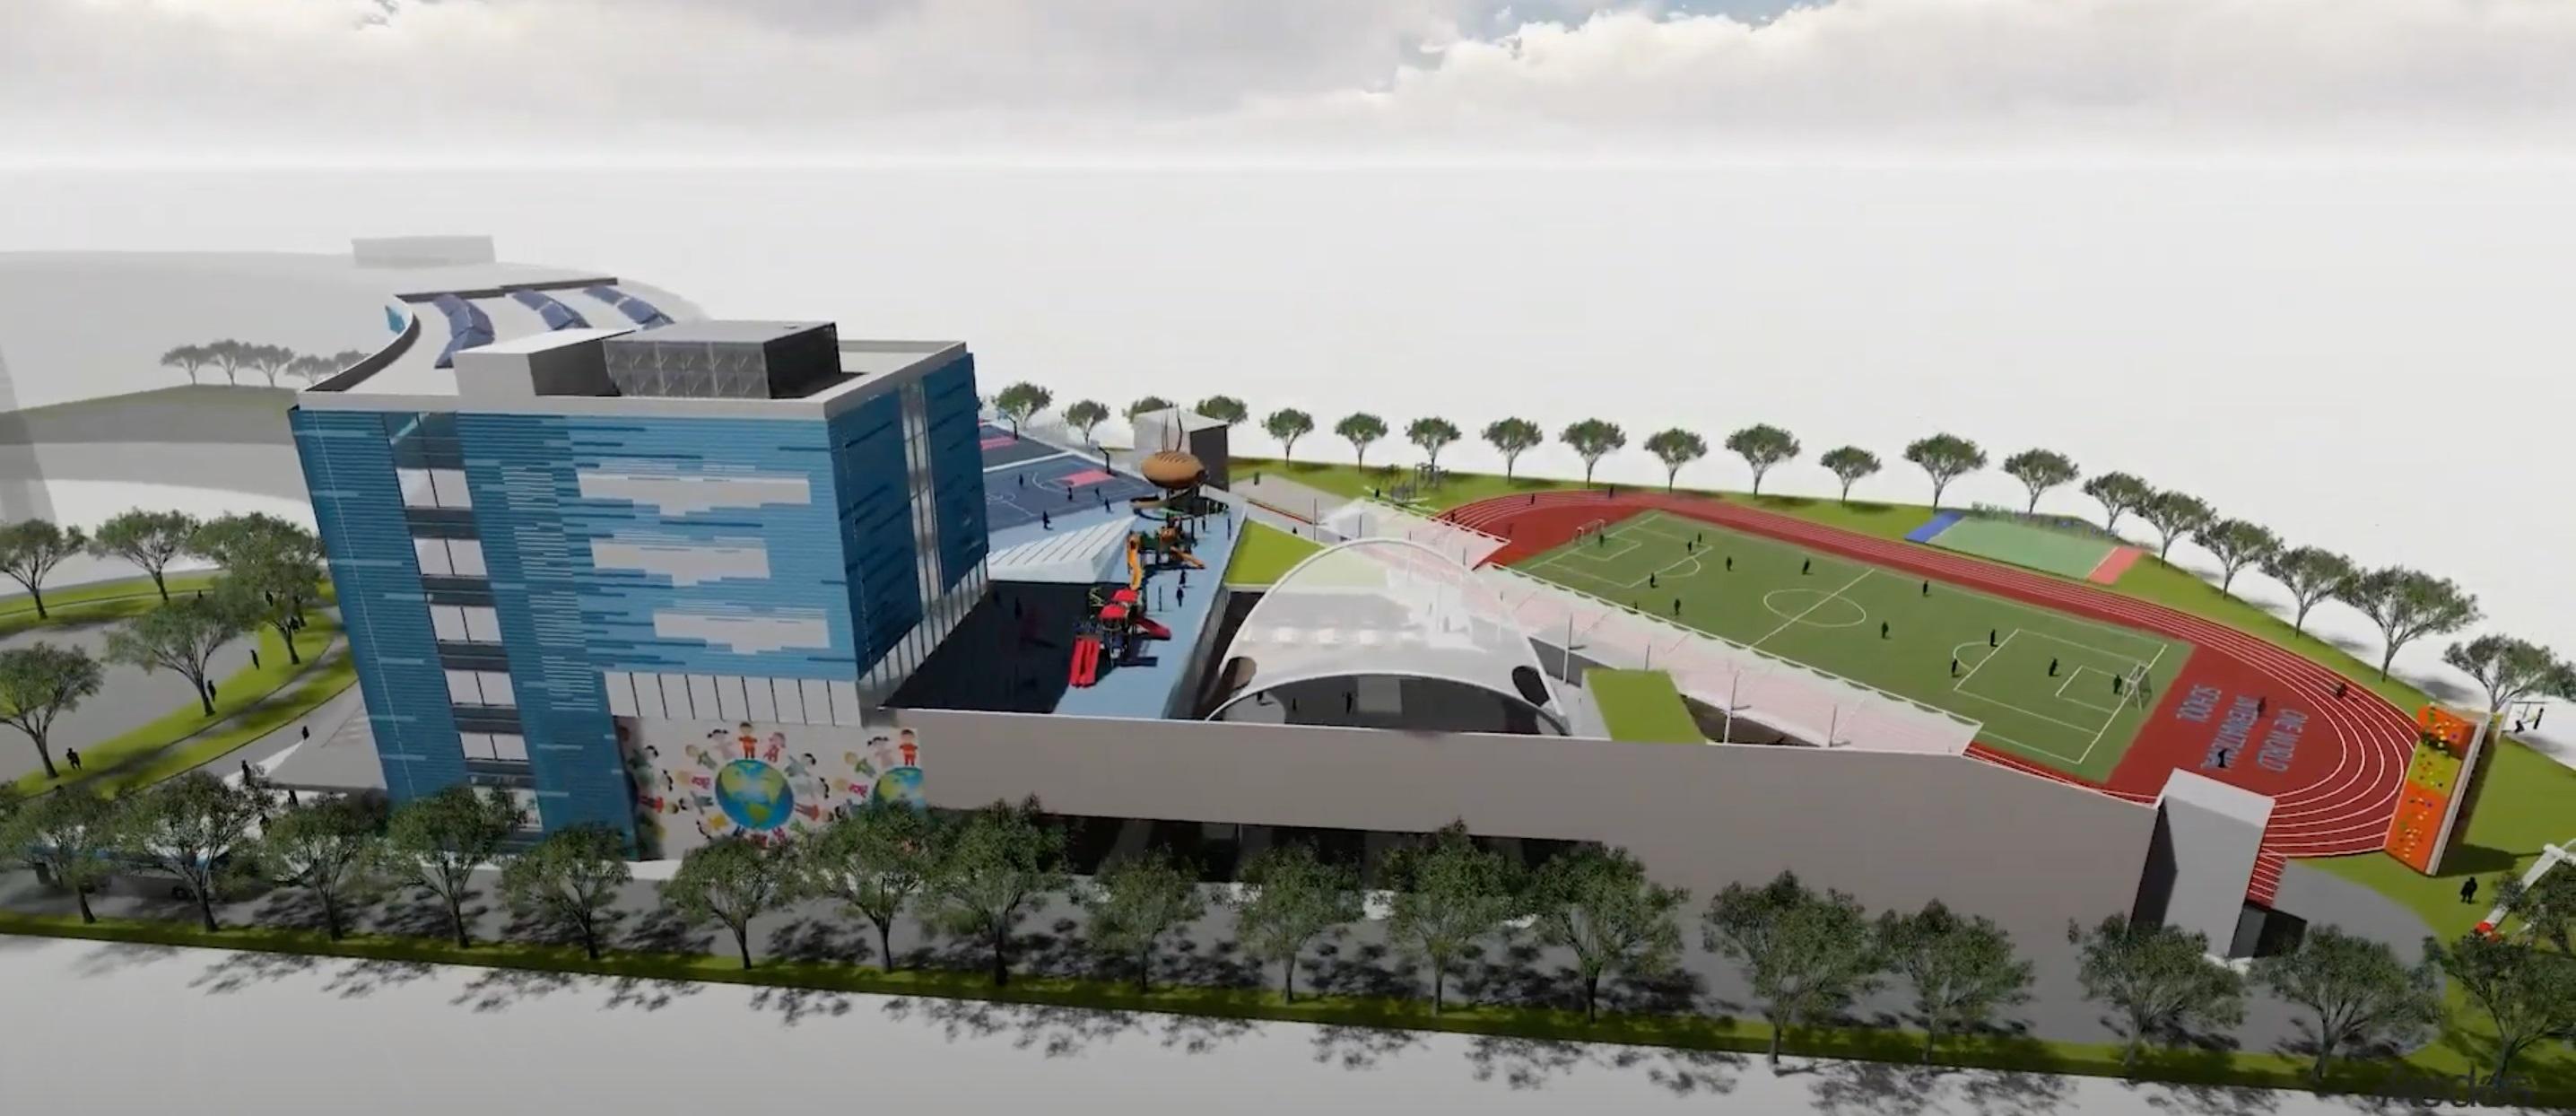 One World International School to launch new fully Digital Campus in Punggol